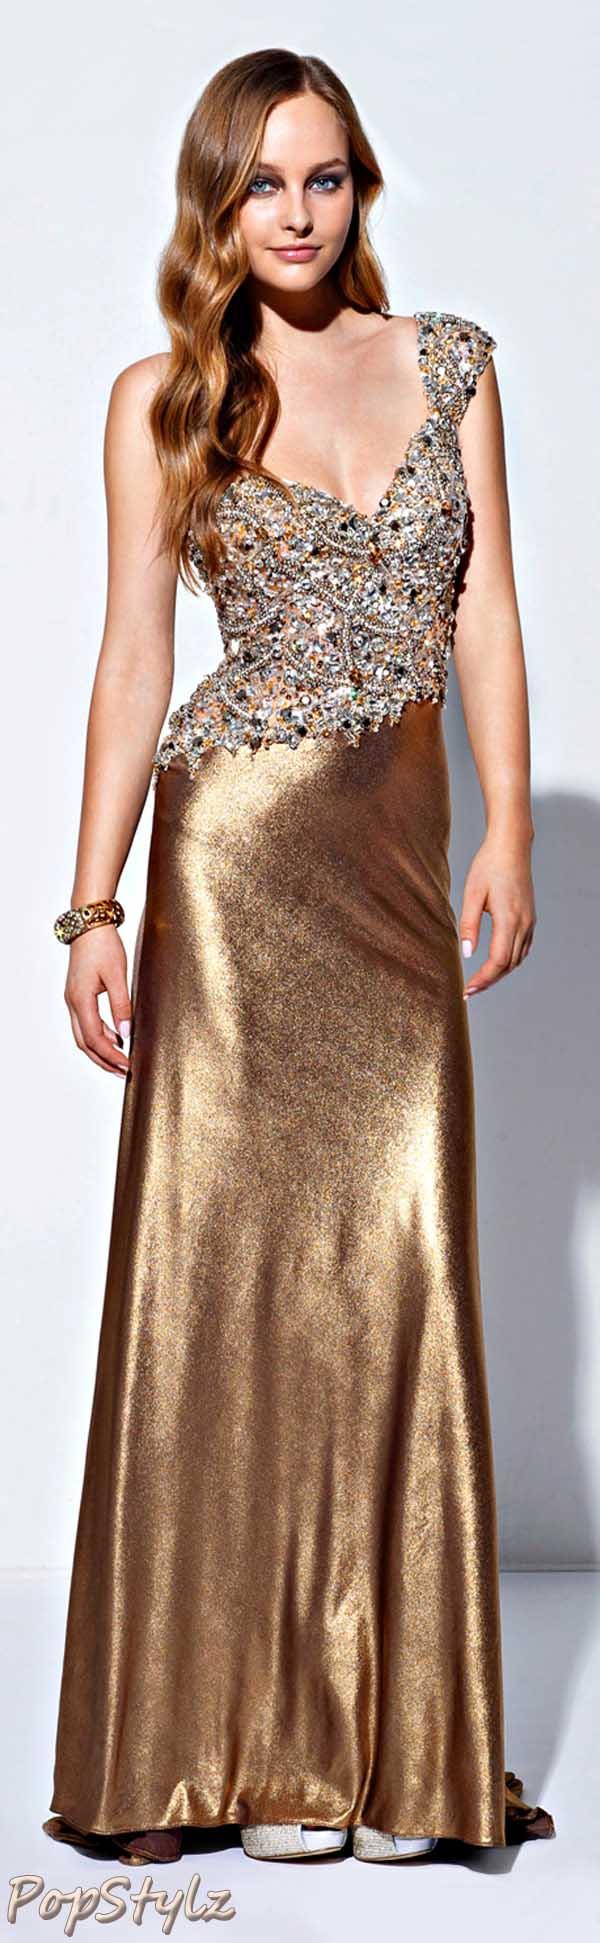 Terani Couture P1555 Dress